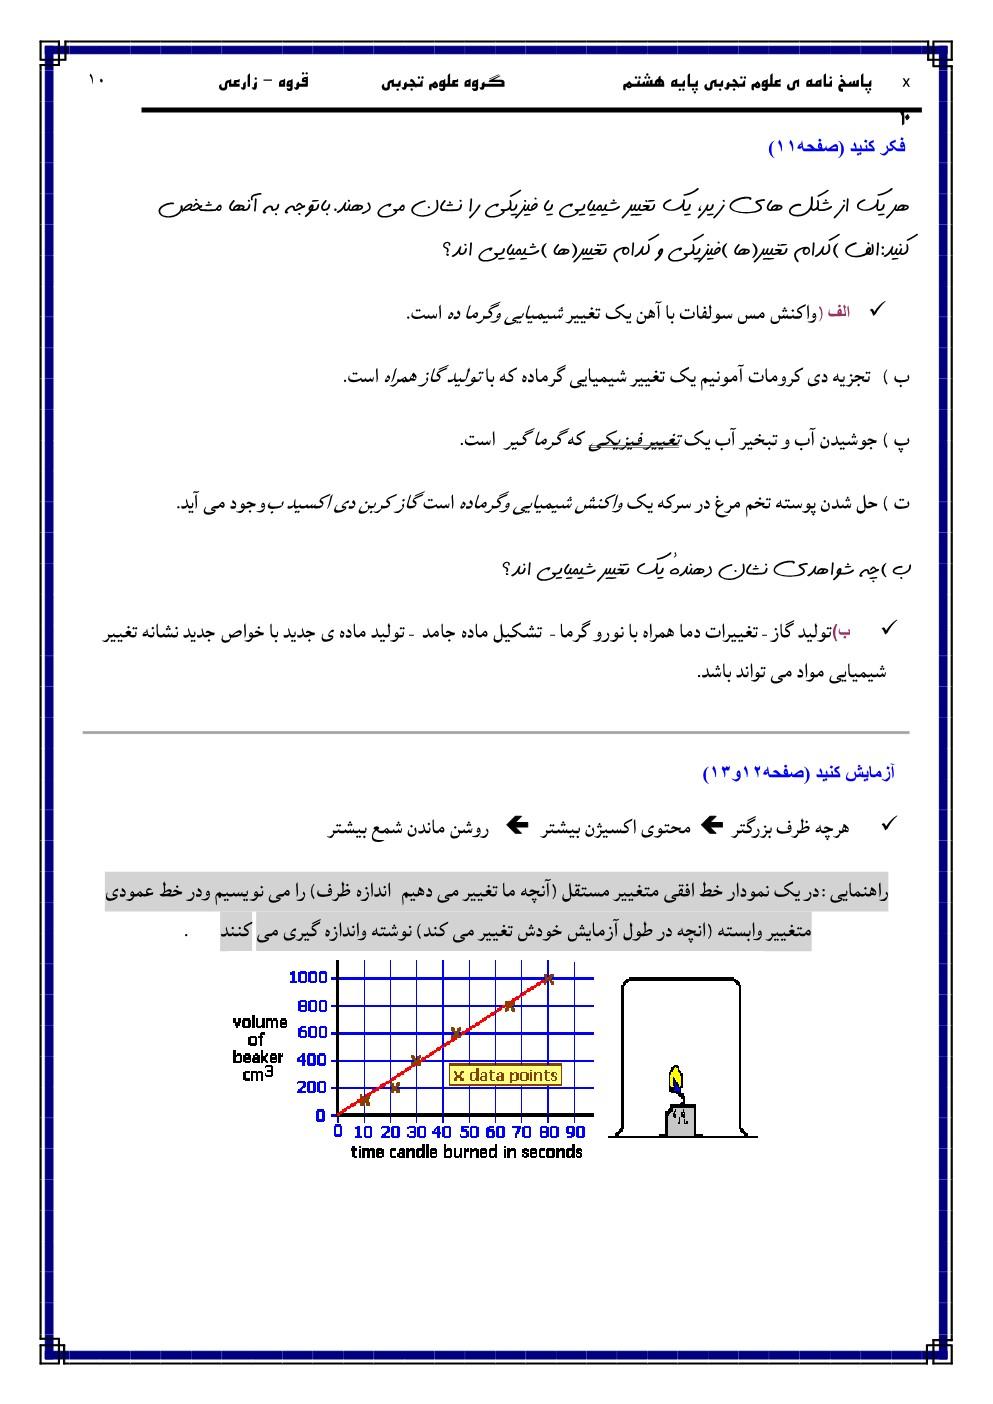 علوم تجربی نمونه سوال علوم پایه هفتم فصل اول تا چهارم